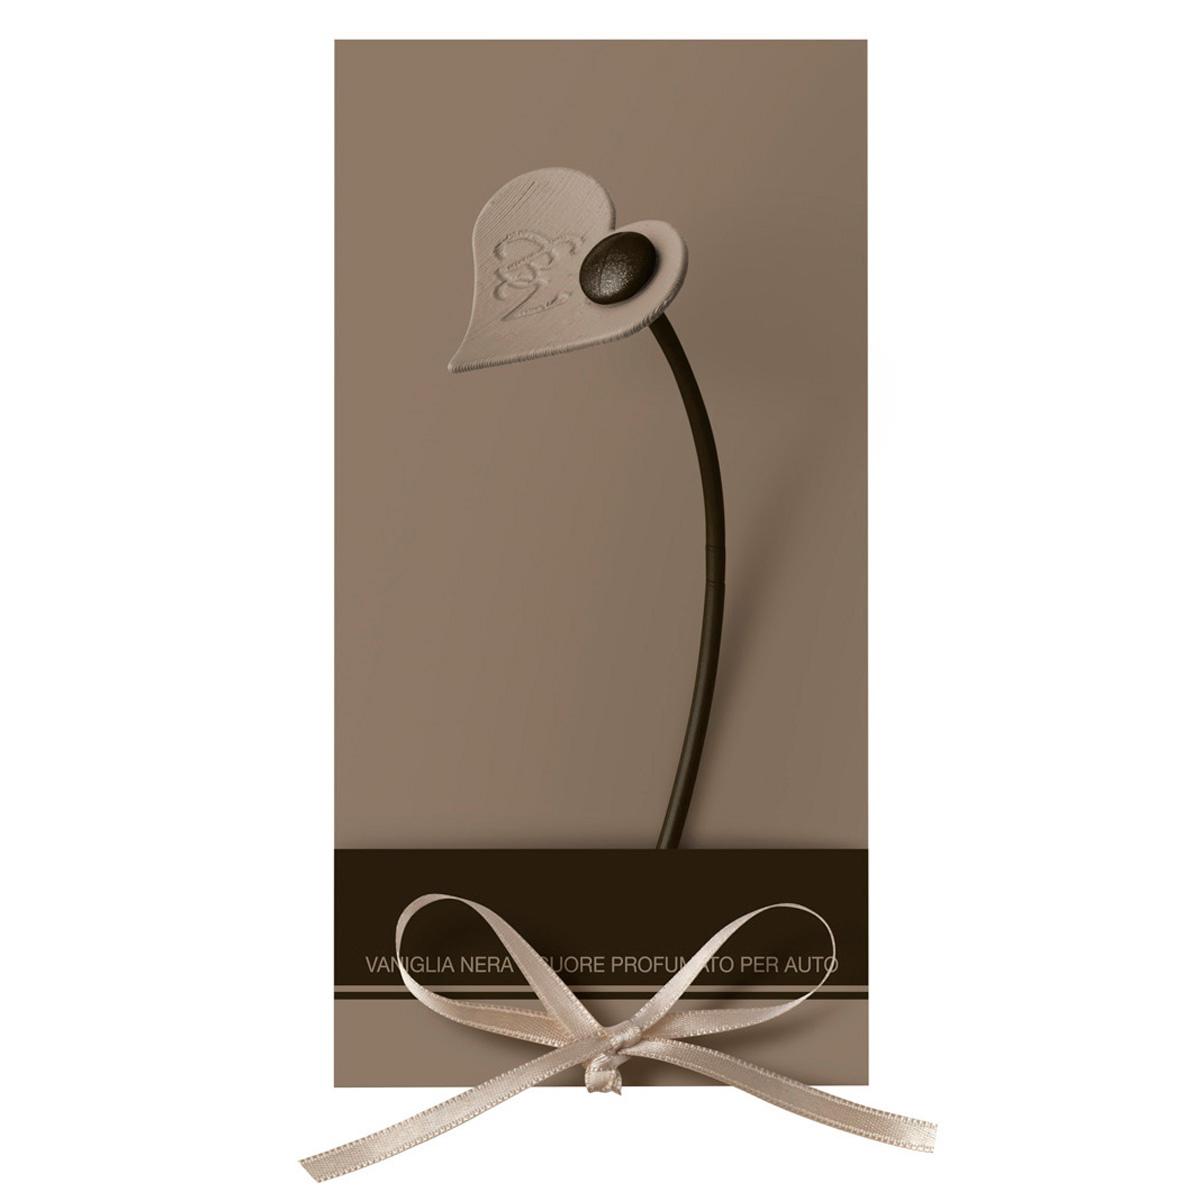 Parfum auto cu aroma de vanilie neagra - Vaniglia Nera